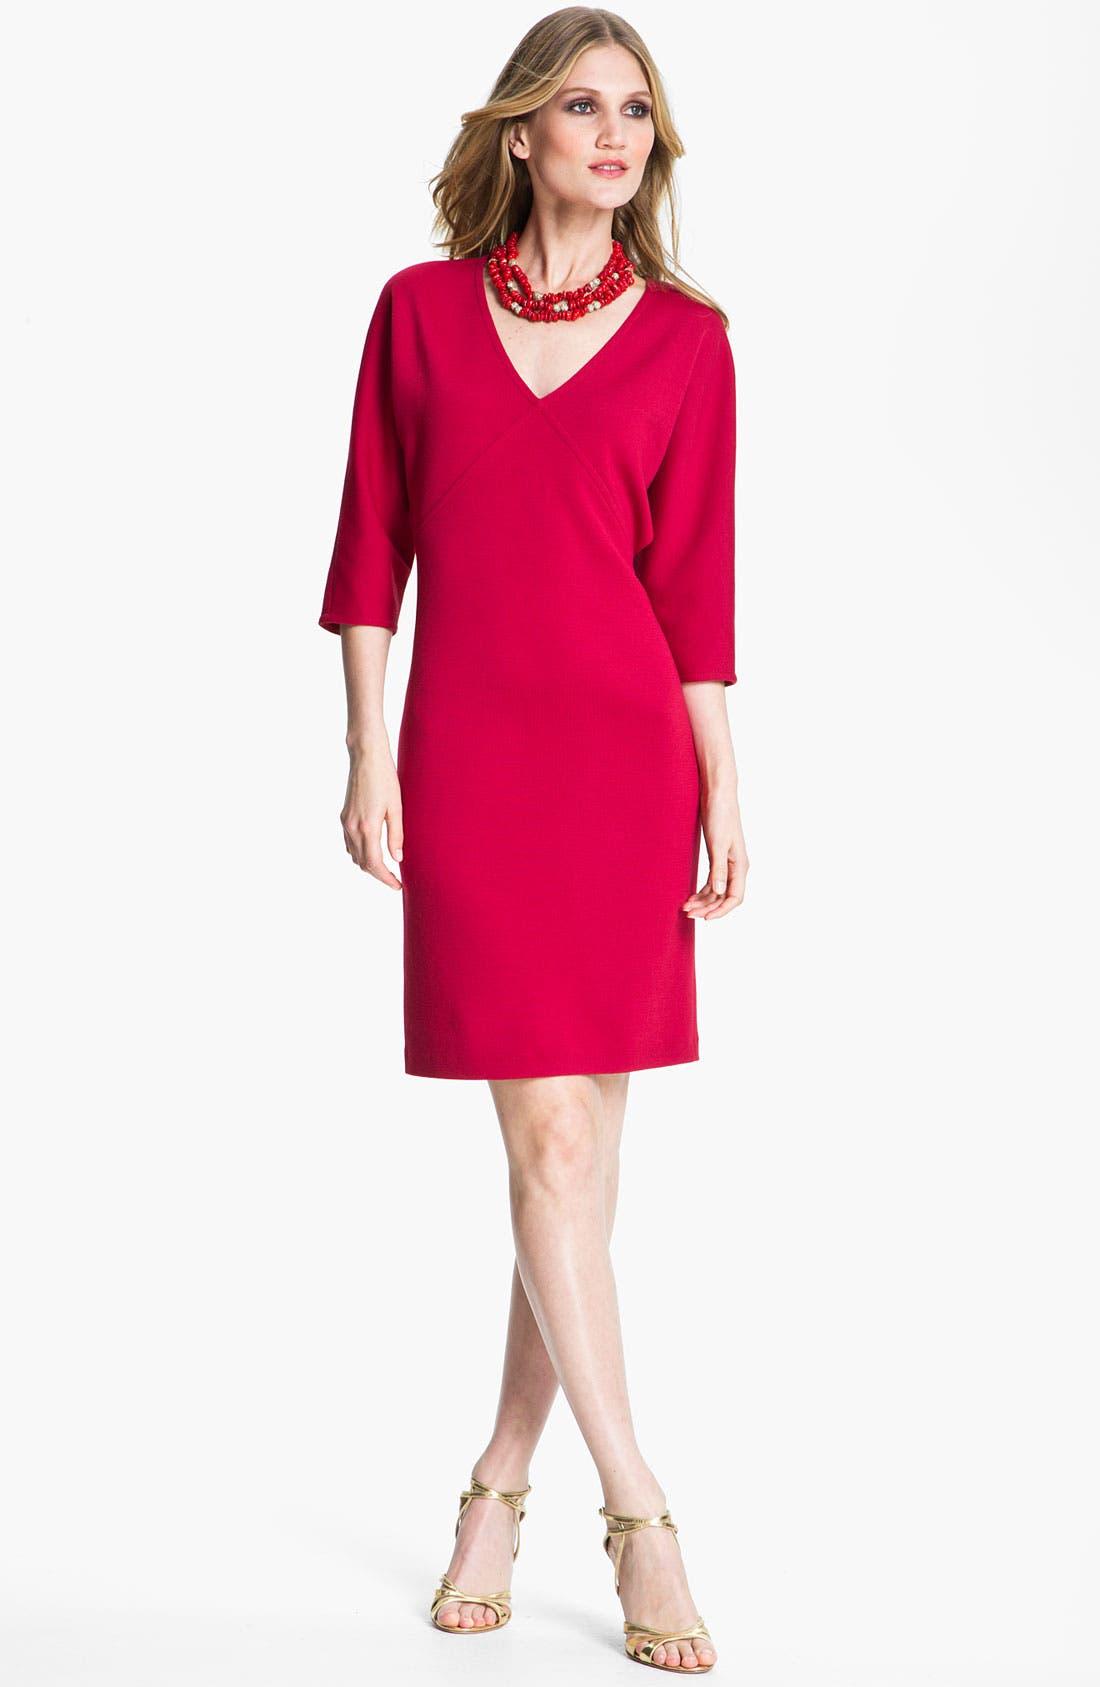 Main Image - St. John Collection V-Neck Milano Knit Dress